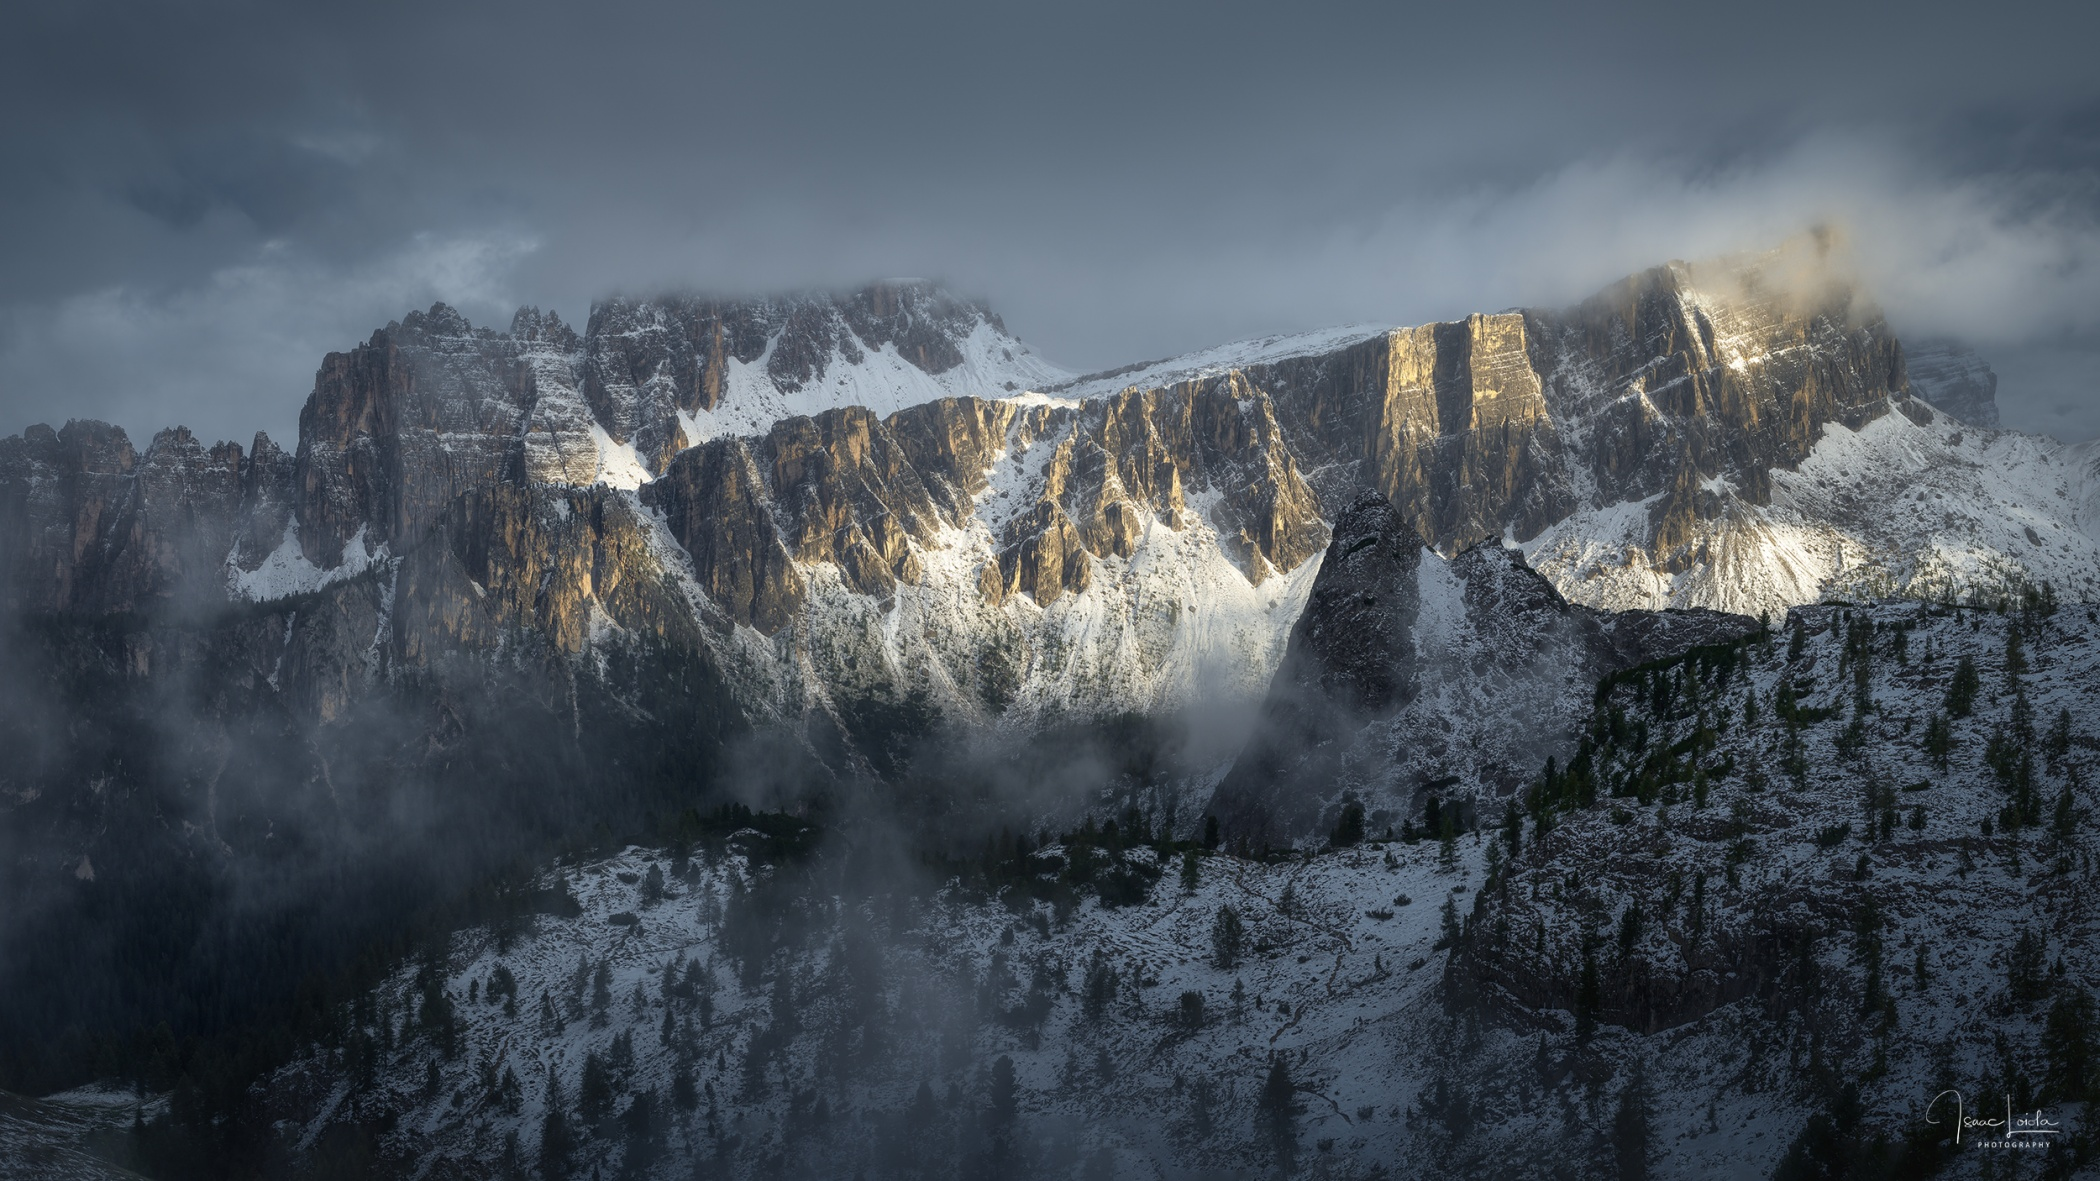 Croda da Lago y Lastoi di Formin - Mountain lights - Isaac Loiola, Photography